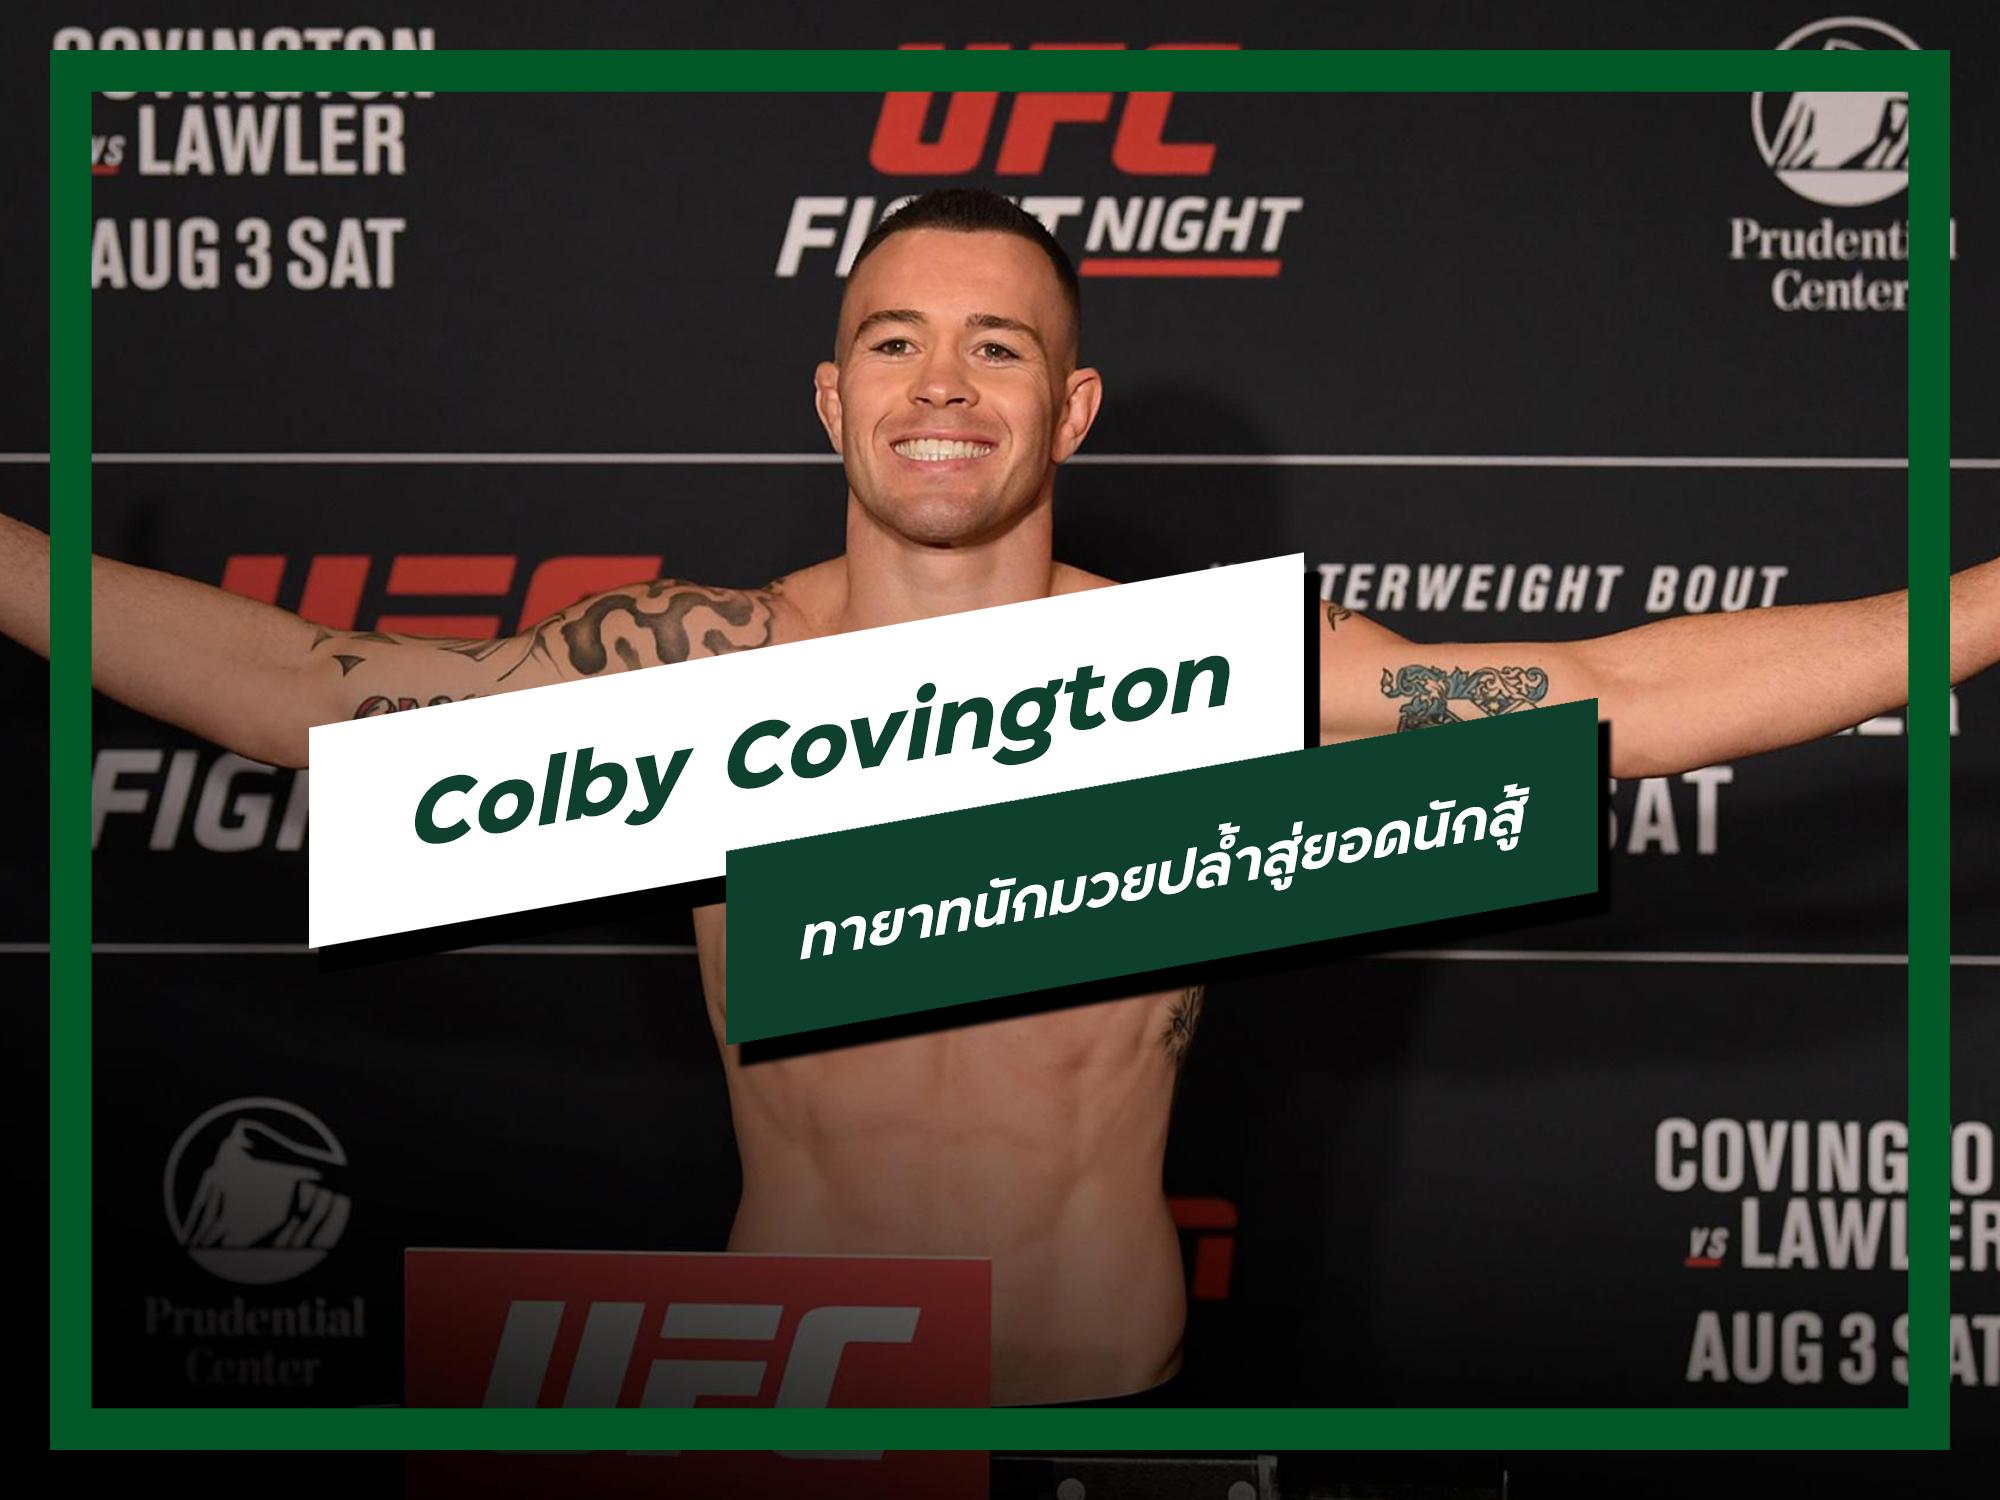 Colby Covington ทายาทนักมวยปล้ำสู่ยอดนักสู้